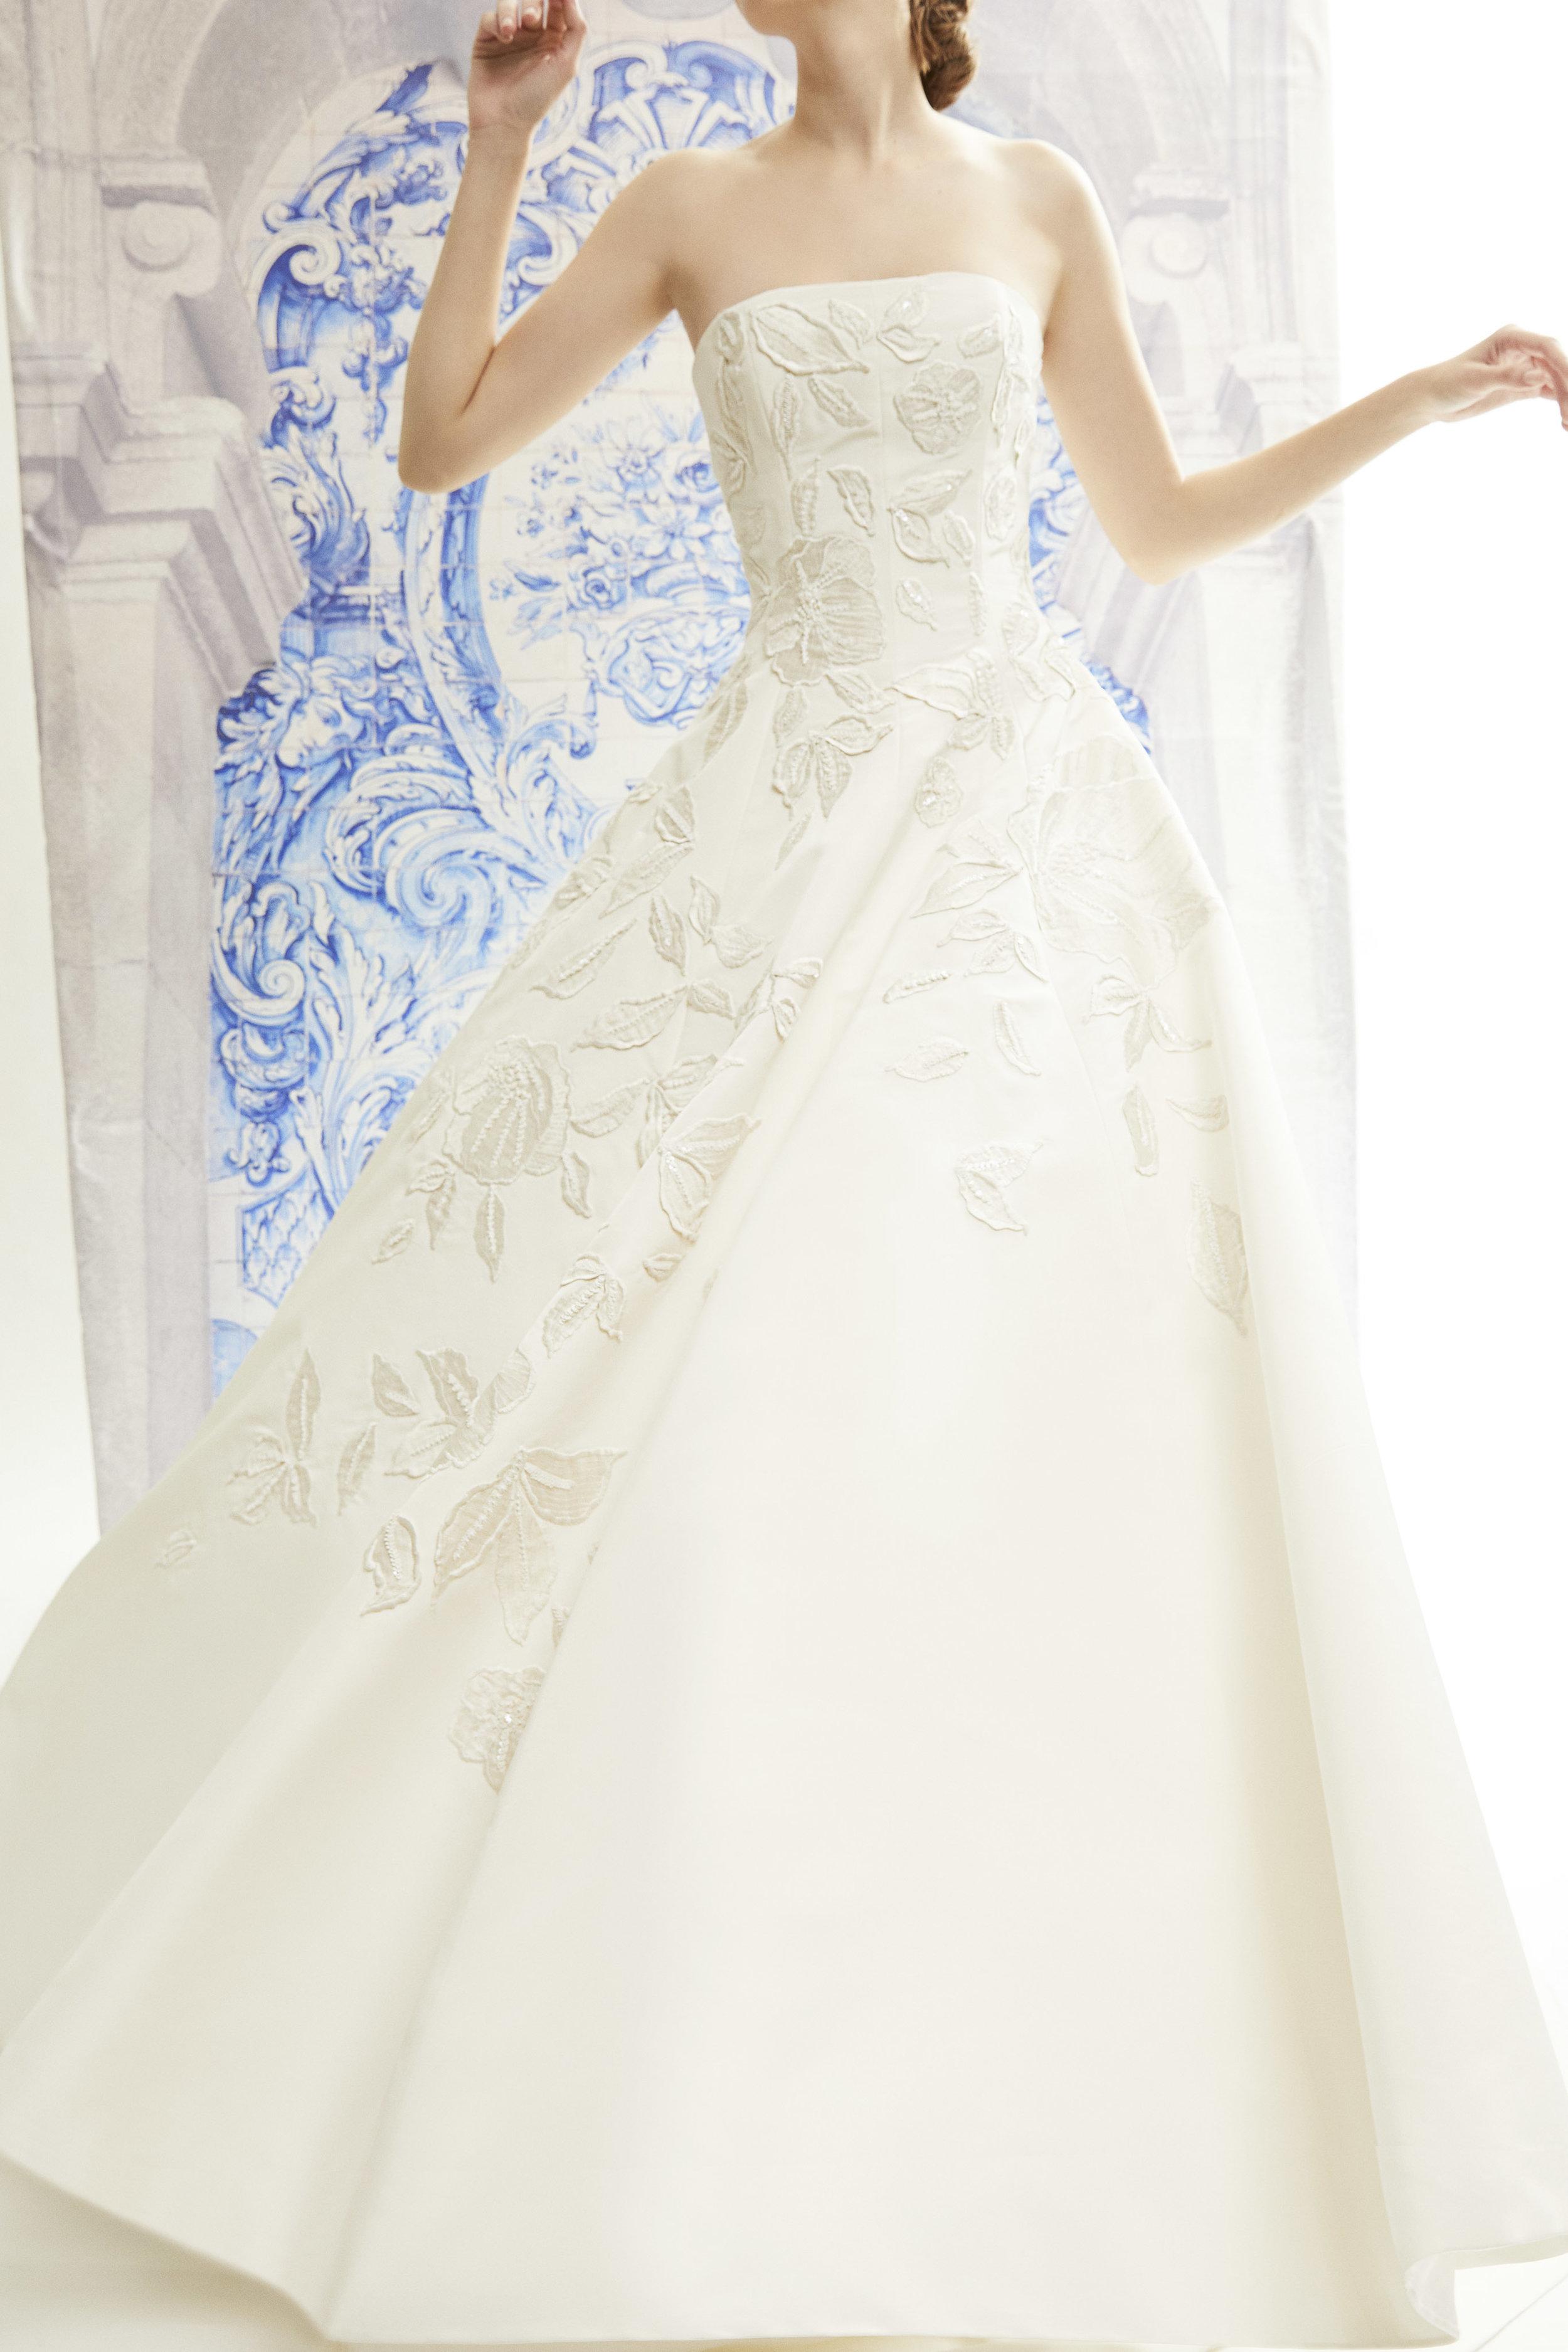 Carolina Herrera Wedding Dresses Outlet 64 Off Newriversidehotel Com